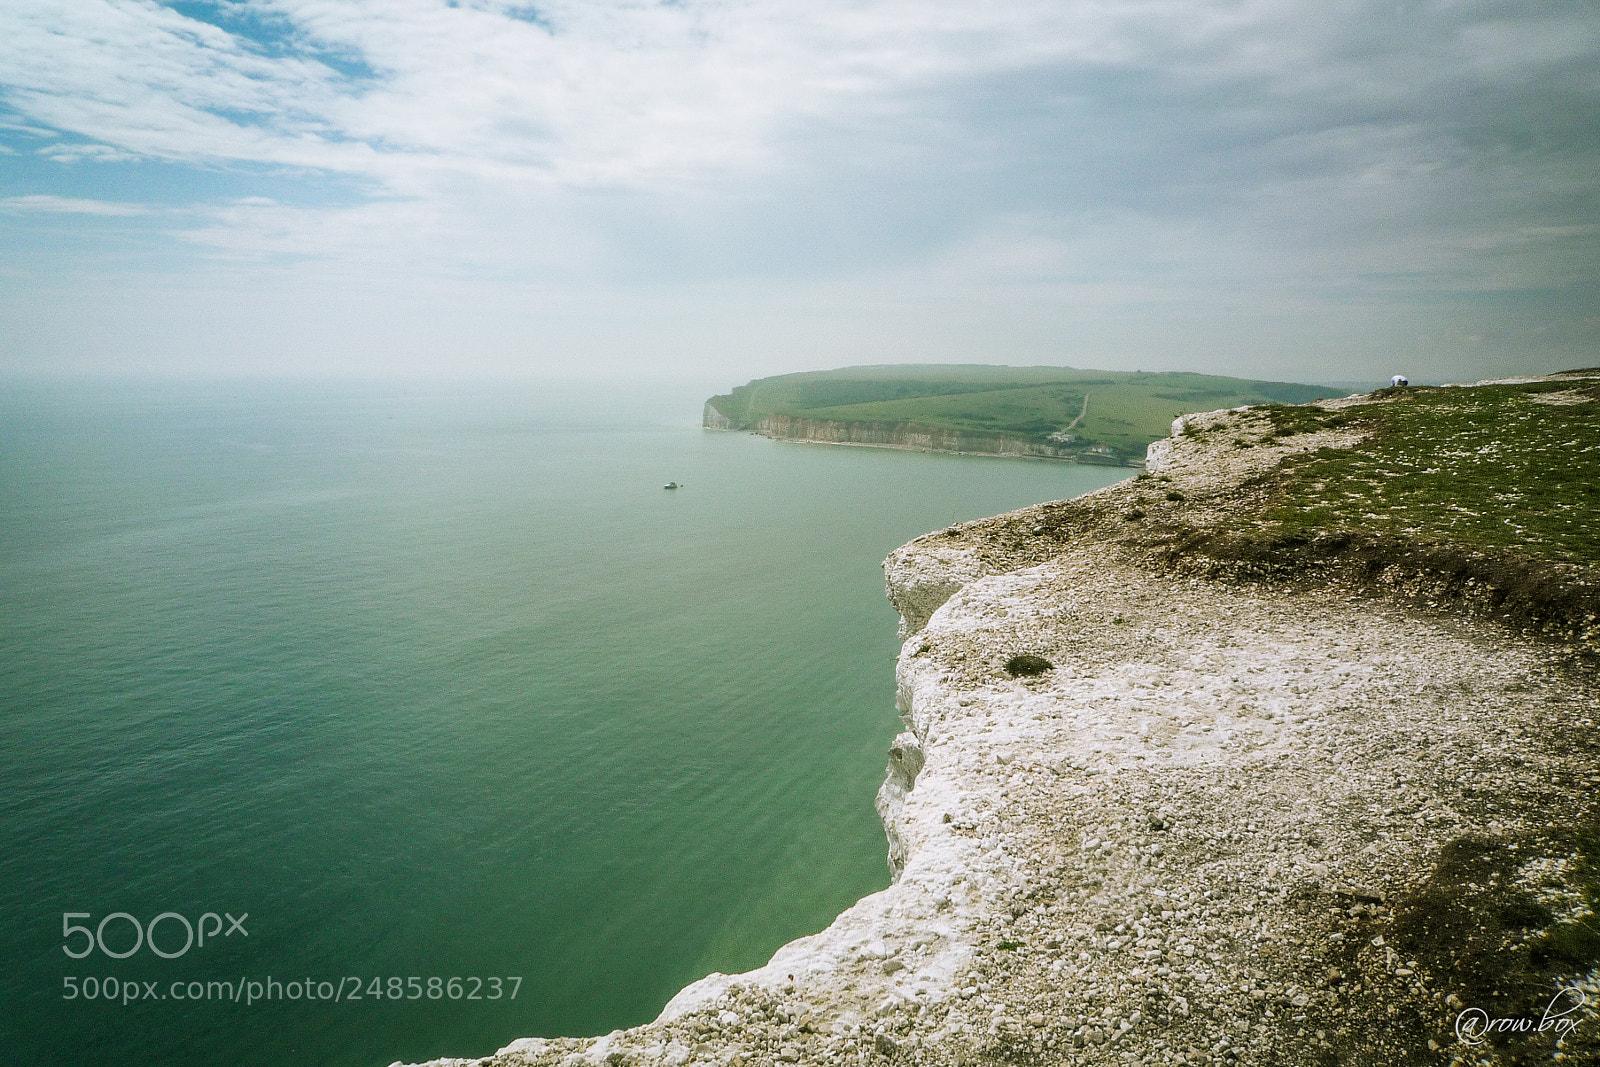 The edge of England, Panasonic DMC-FX35